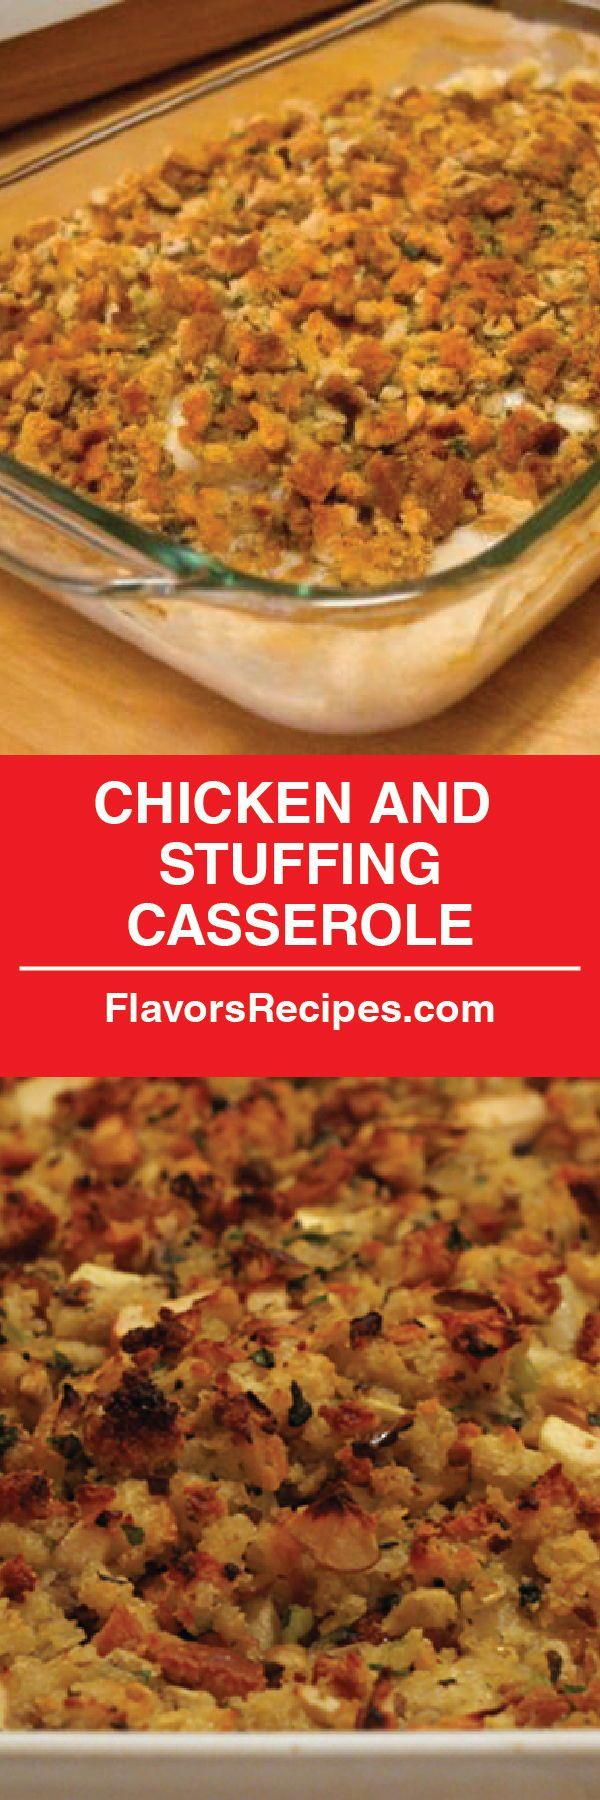 Chicken and Stuffing Casserole!!!